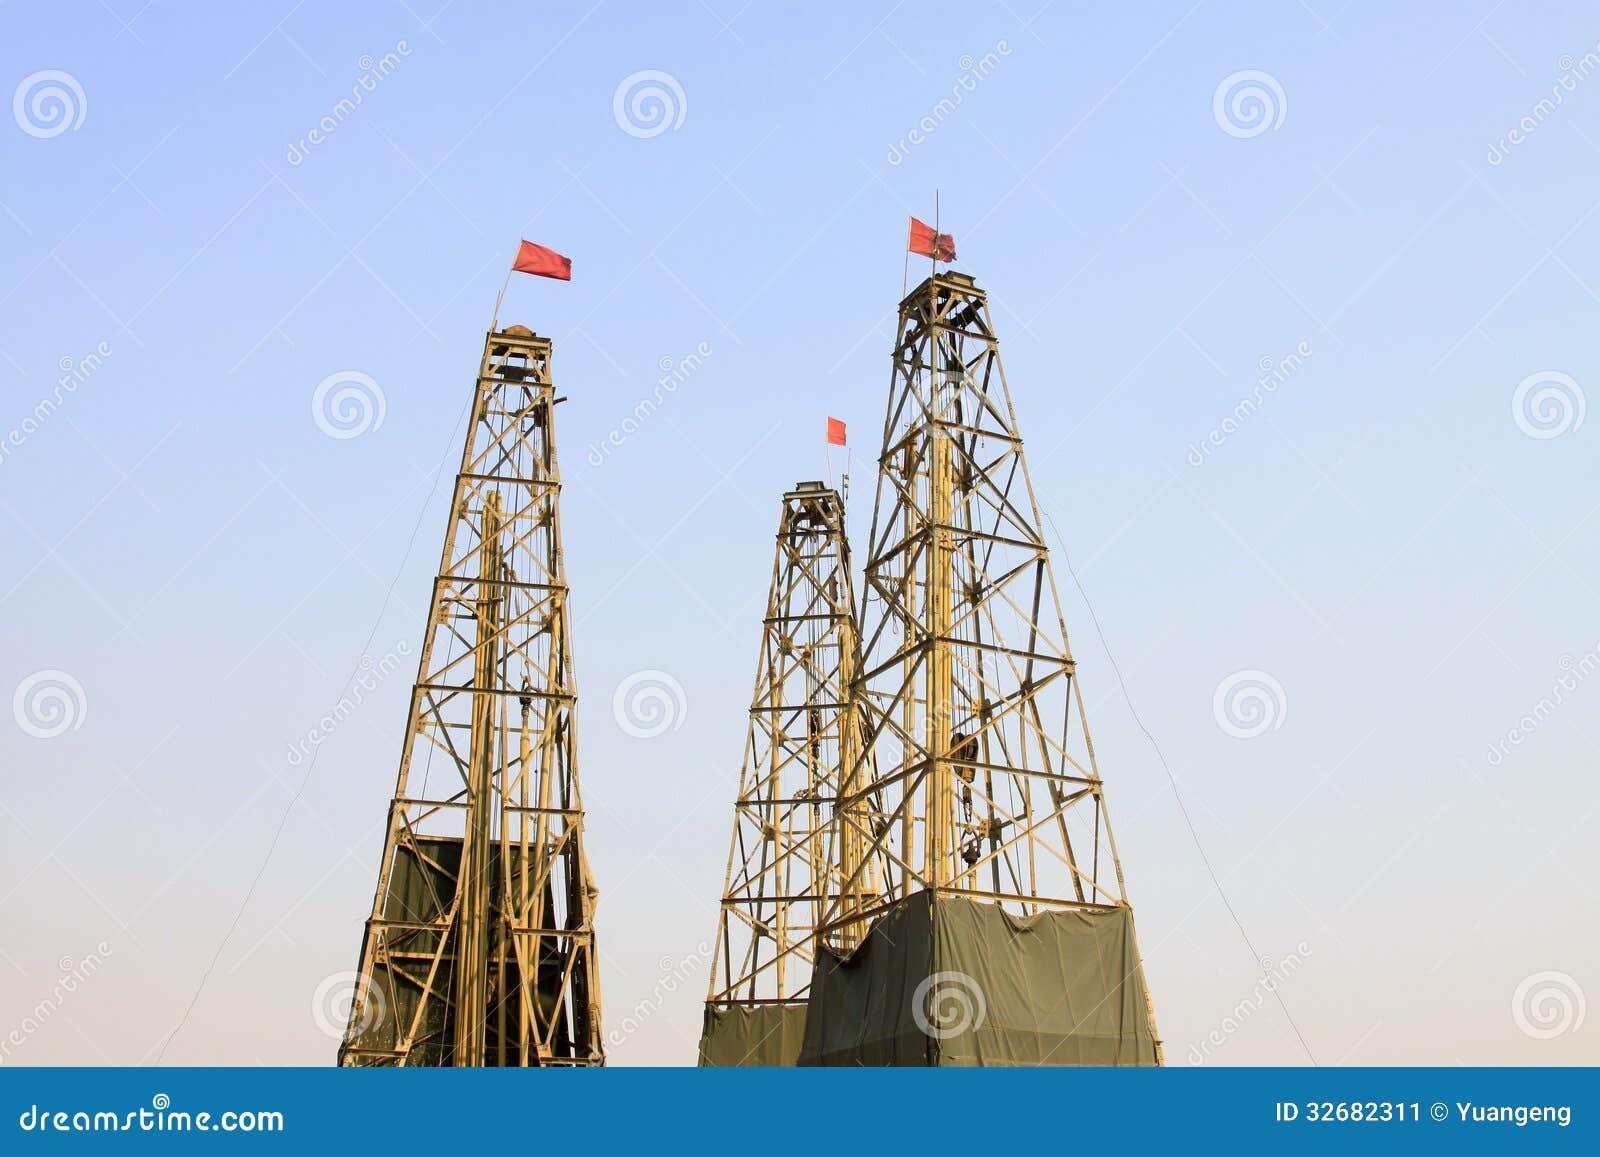 Torre di perforazione in una miniera del ferro immagine for Costruire una torre di osservazione